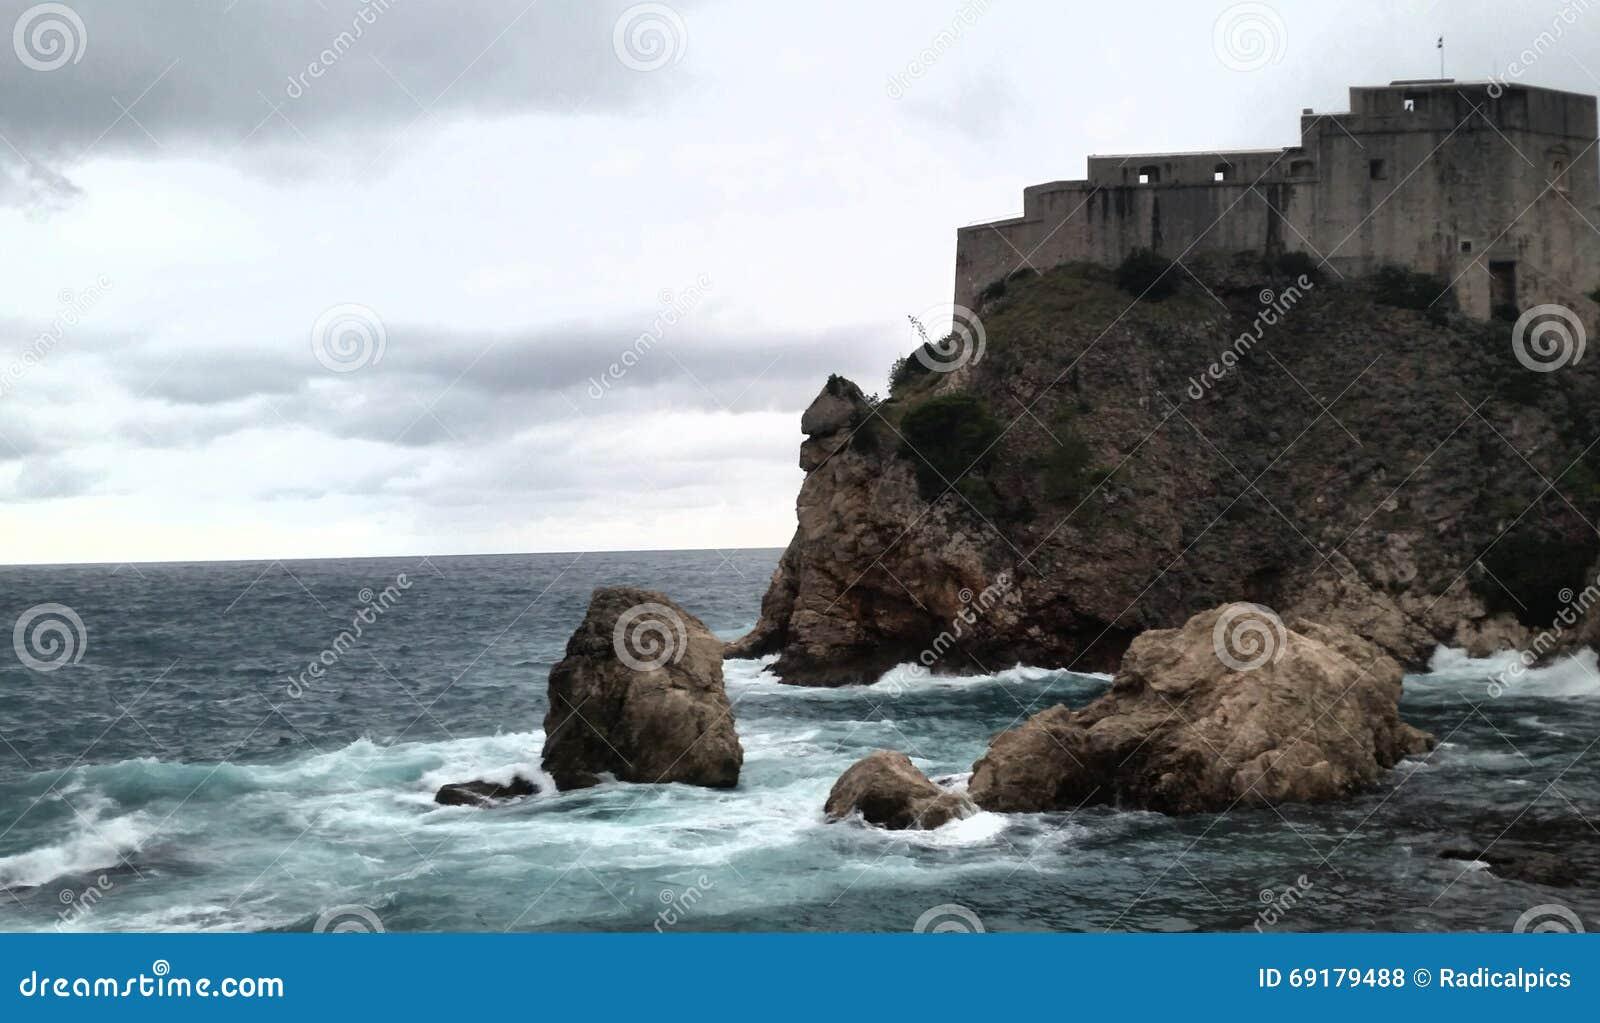 Medieval Dubrovnik Croatia Game Of Thrones Stock Photo